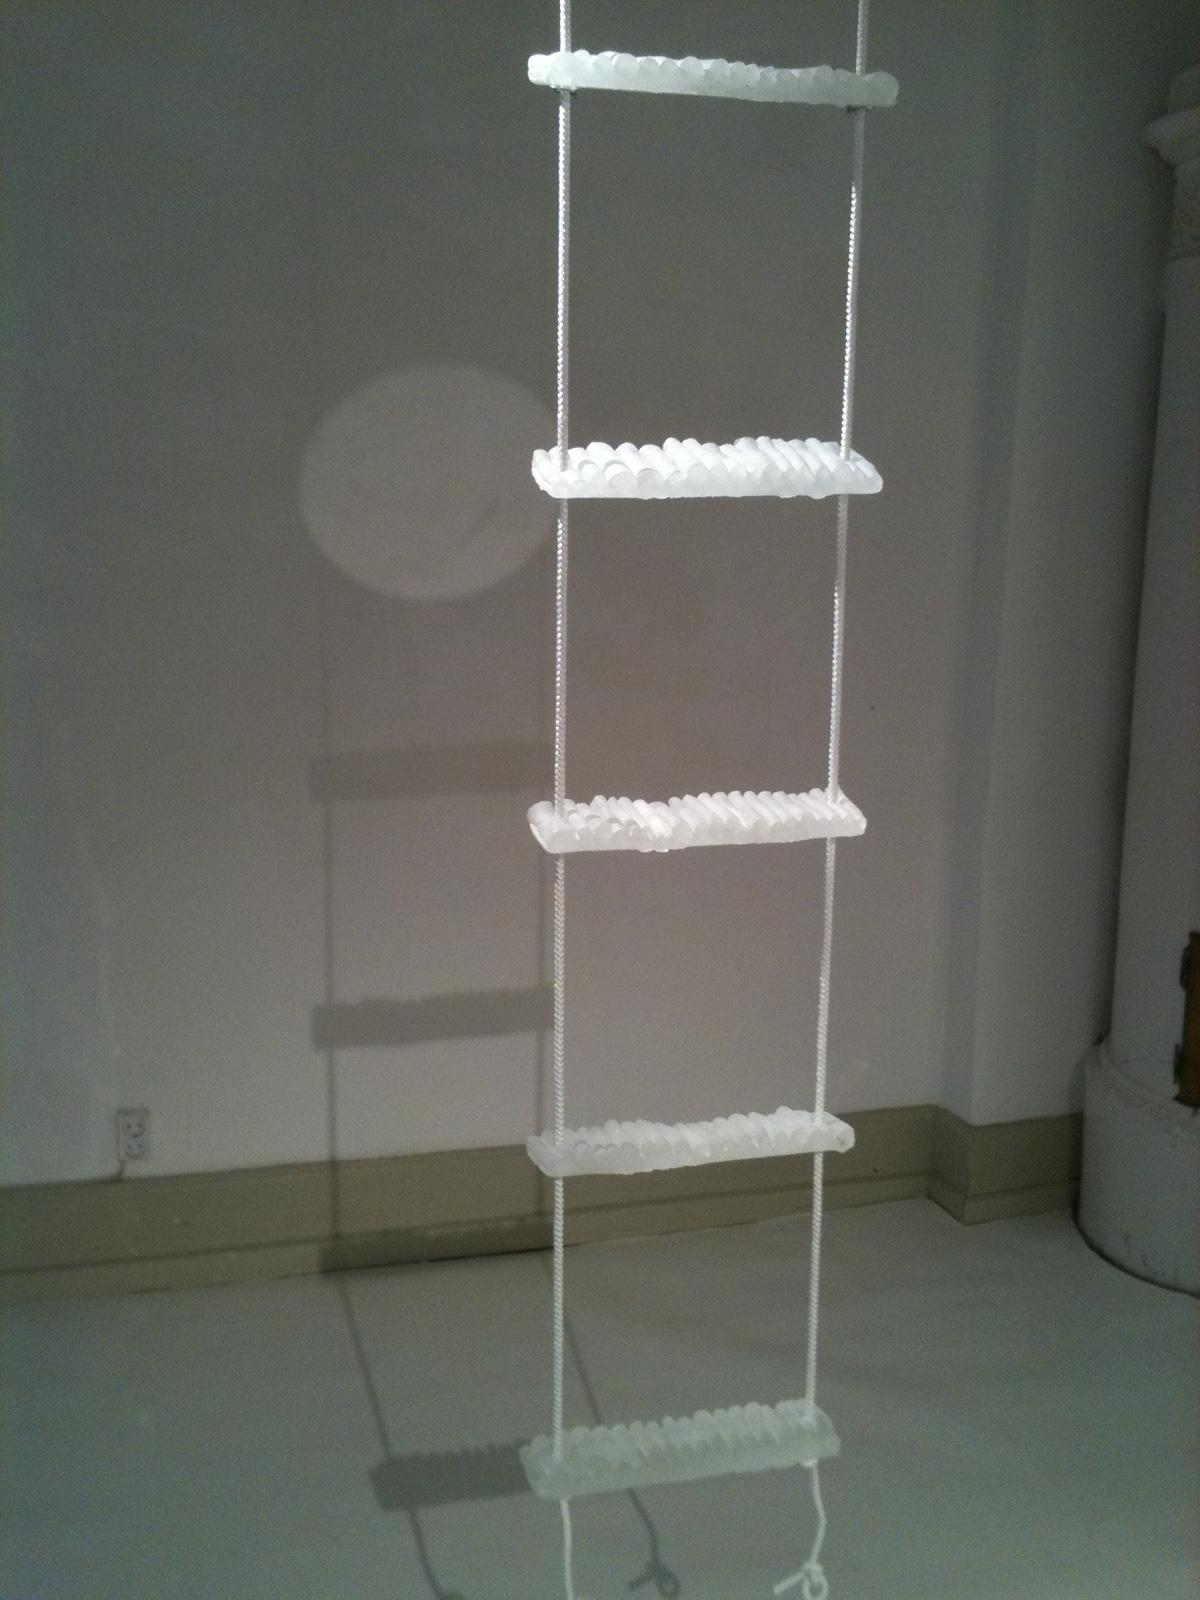 Lena NIlsson, Stege, gjutet glas och rep, 30 cm x 160 cm. Pris 20.020:-